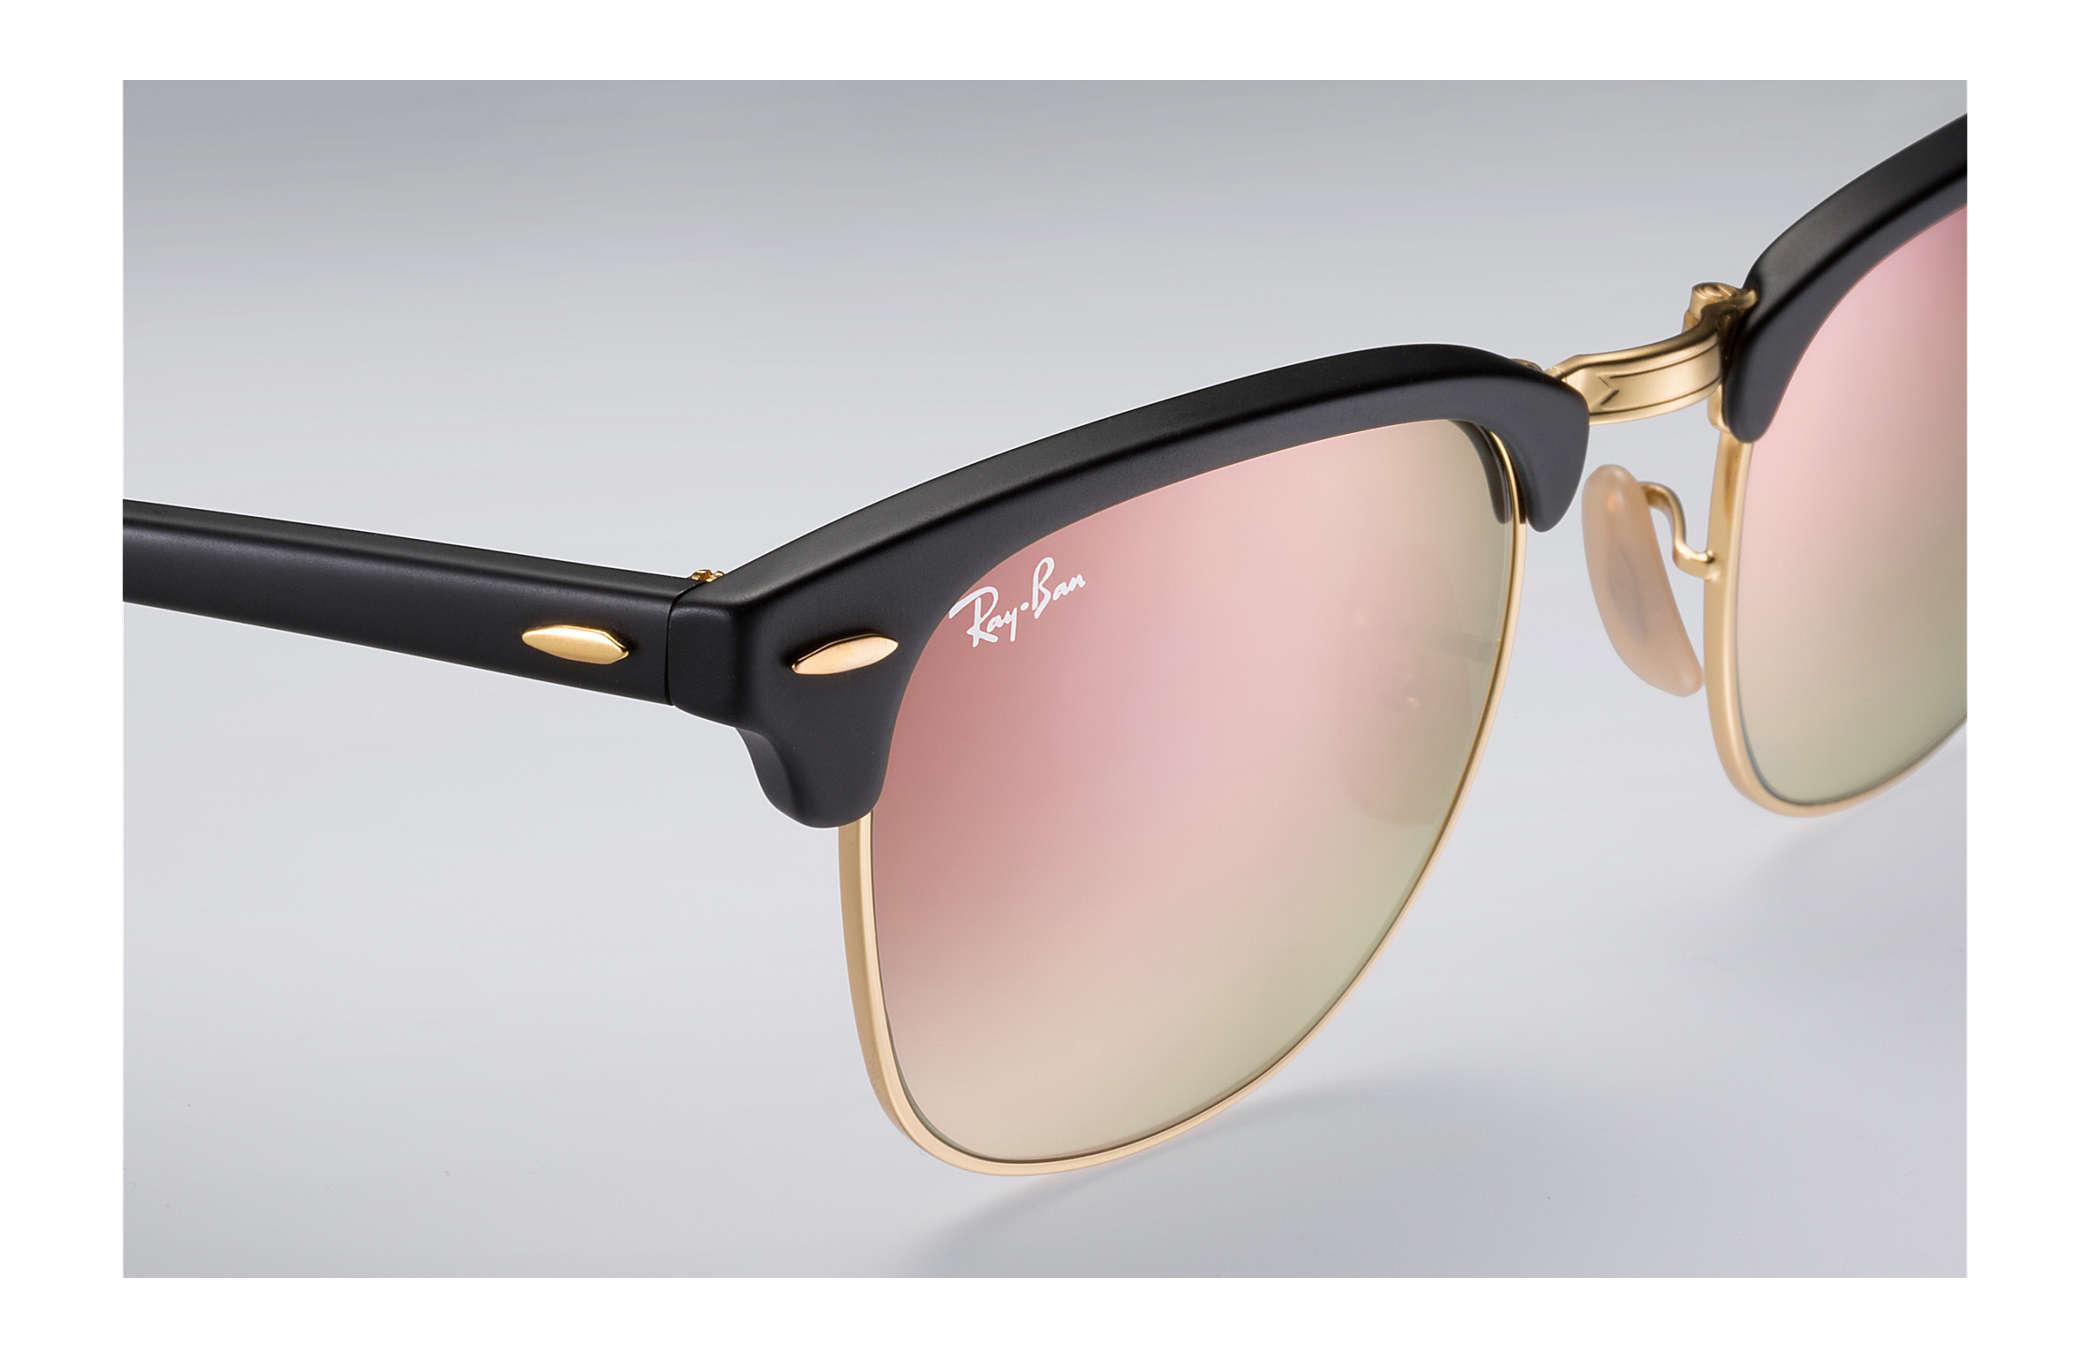 0291a8ed65 ... Ray-Ban 0RB2176-CLUBMASTER FOLDING FLASH LENSES GRADIENT Black  Gold  SUN ...